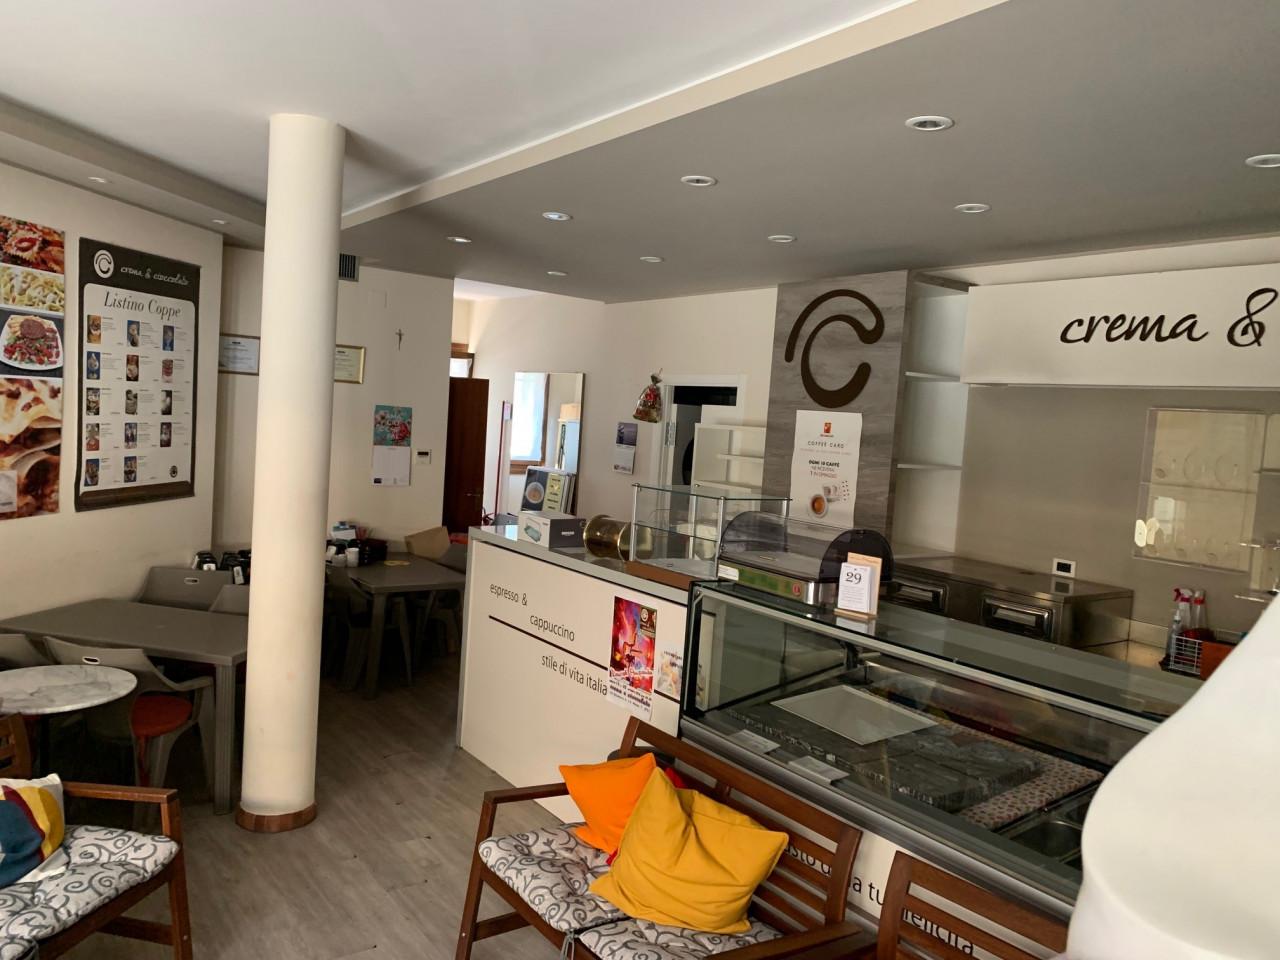 Offerta C551 - Negozio in affitto zona Pedonale https://images.gestionaleimmobiliare.it/foto/annunci/210719/2695659/1280x1280/999__1.jpg